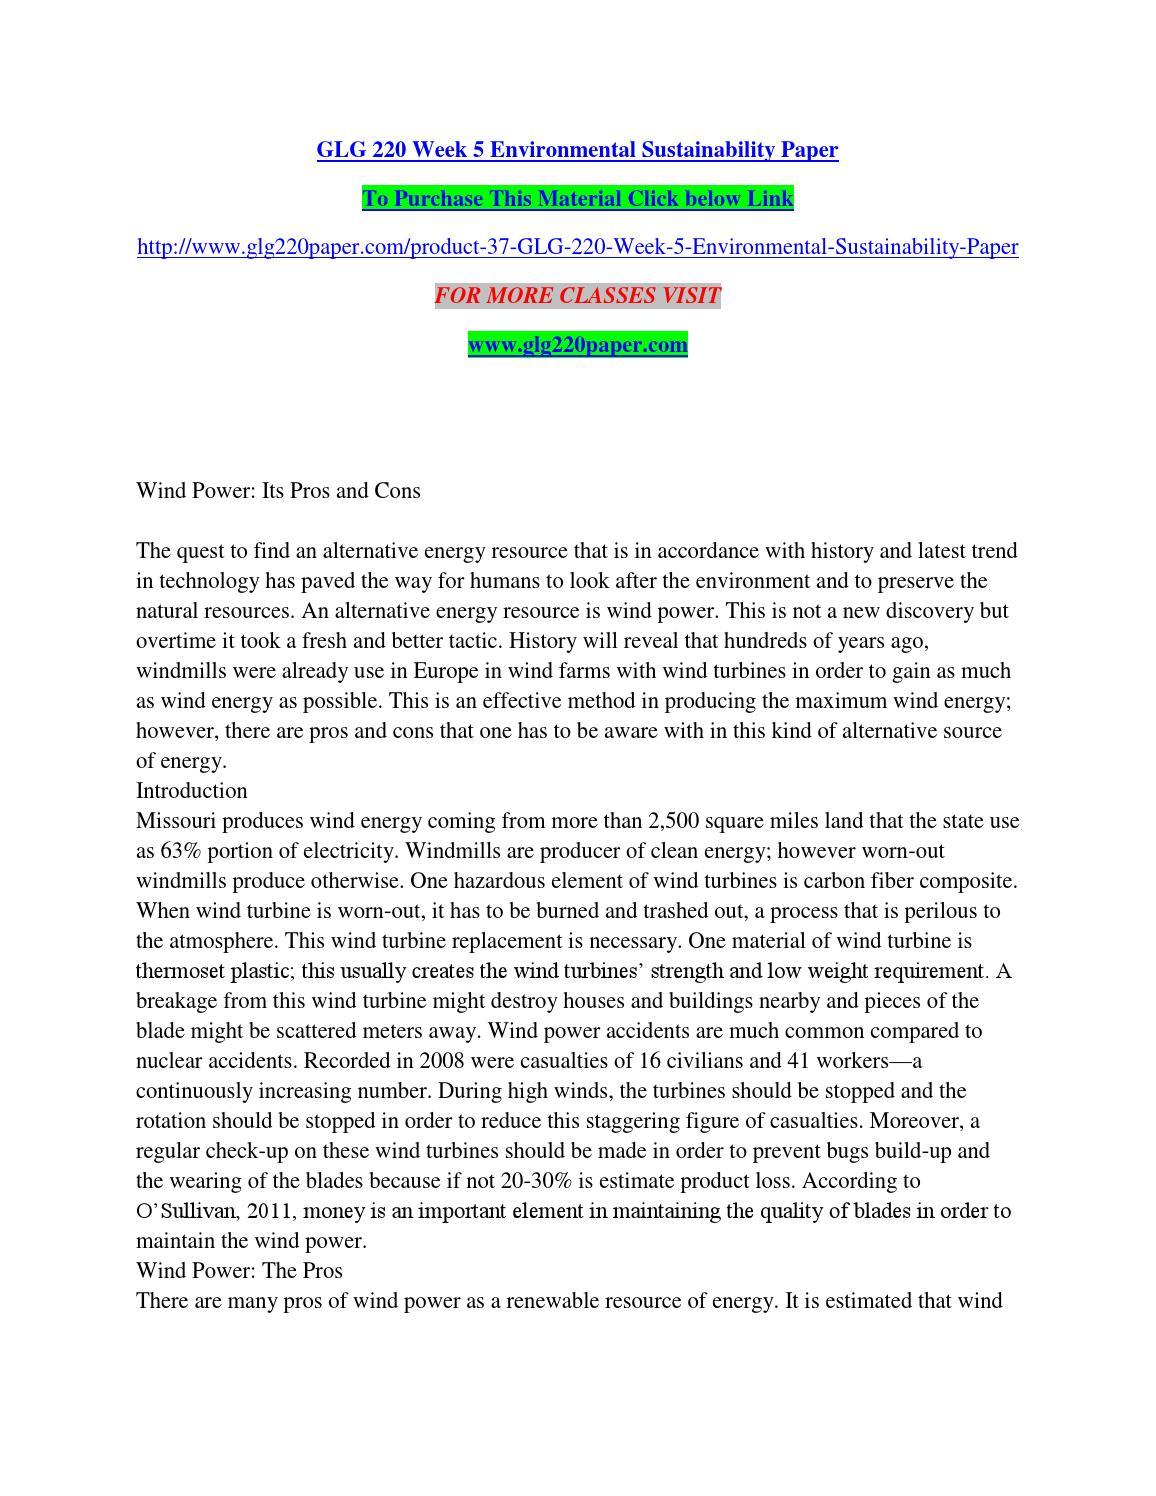 Sustainability Paper Topics